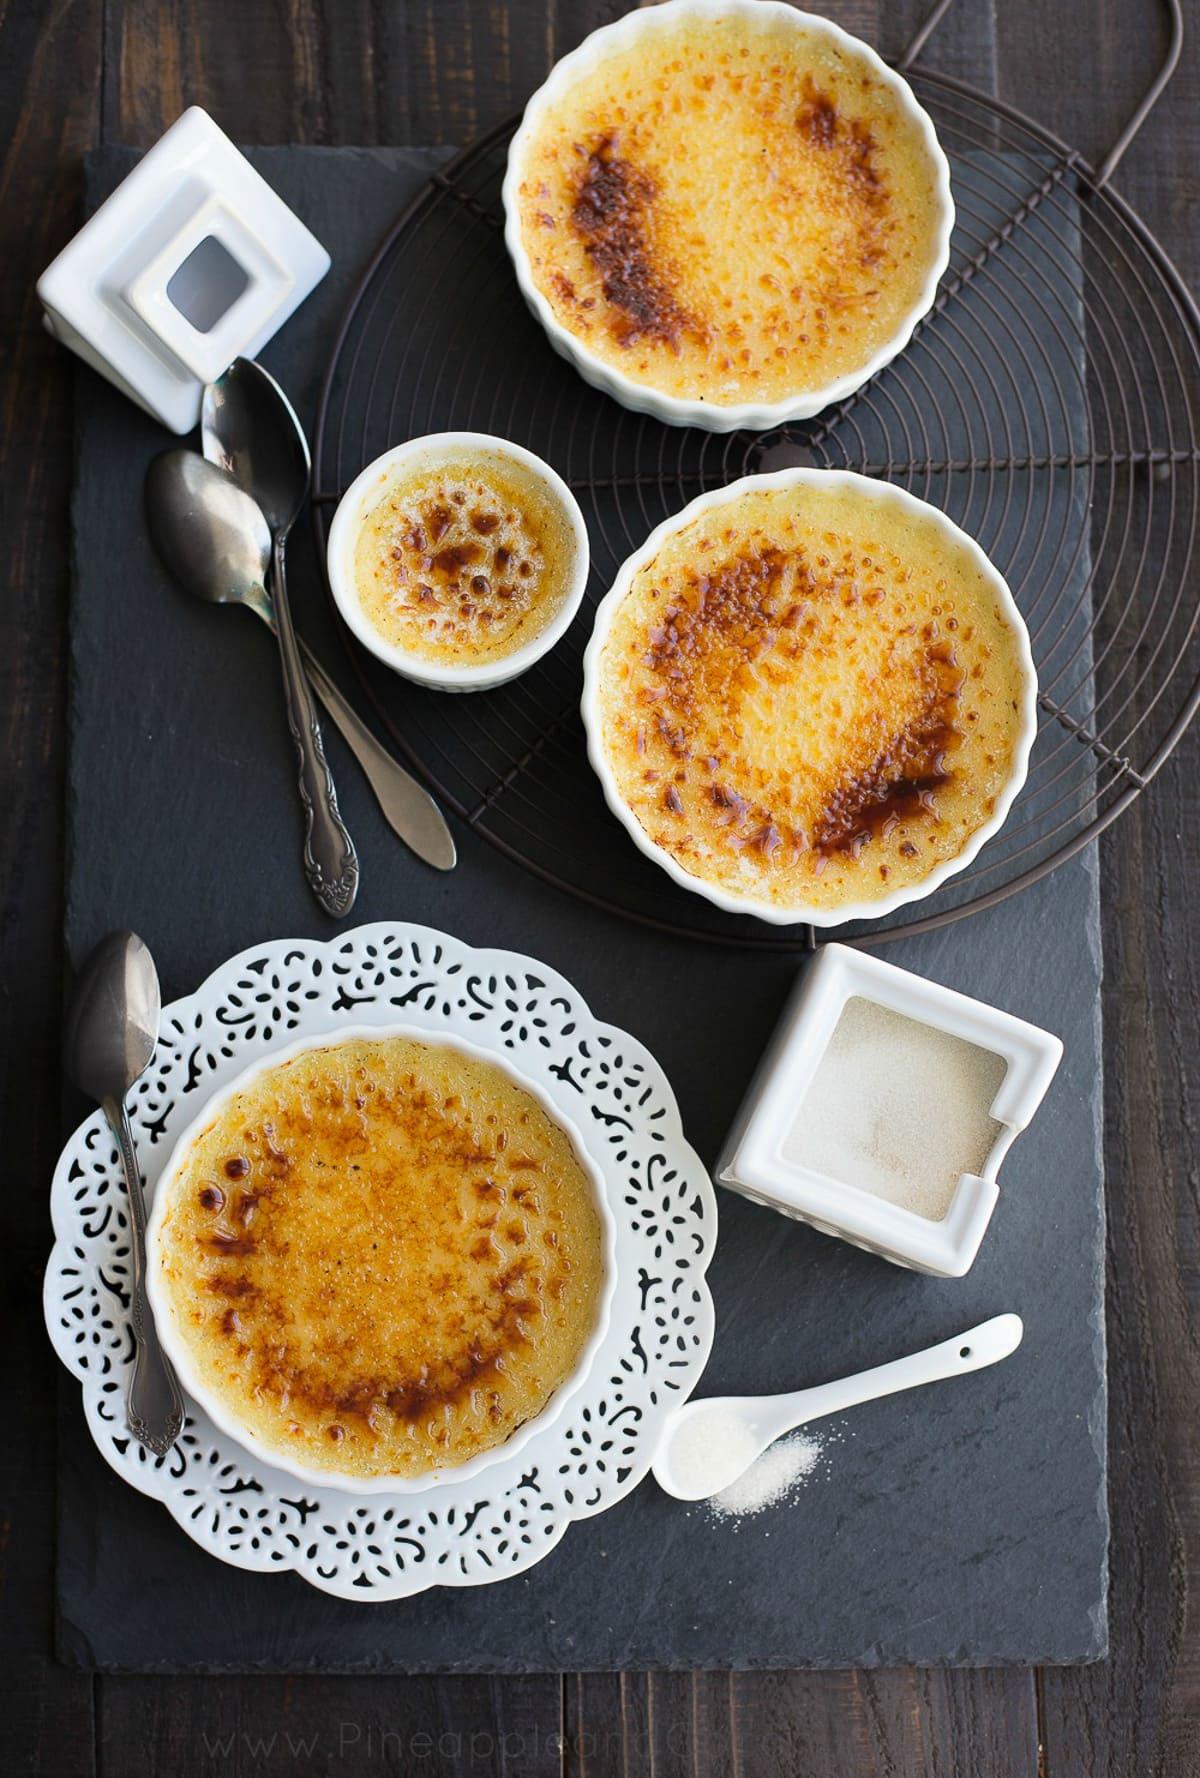 yellow custard creme brulee in white ramekins spoons white sugar bowl black slate board